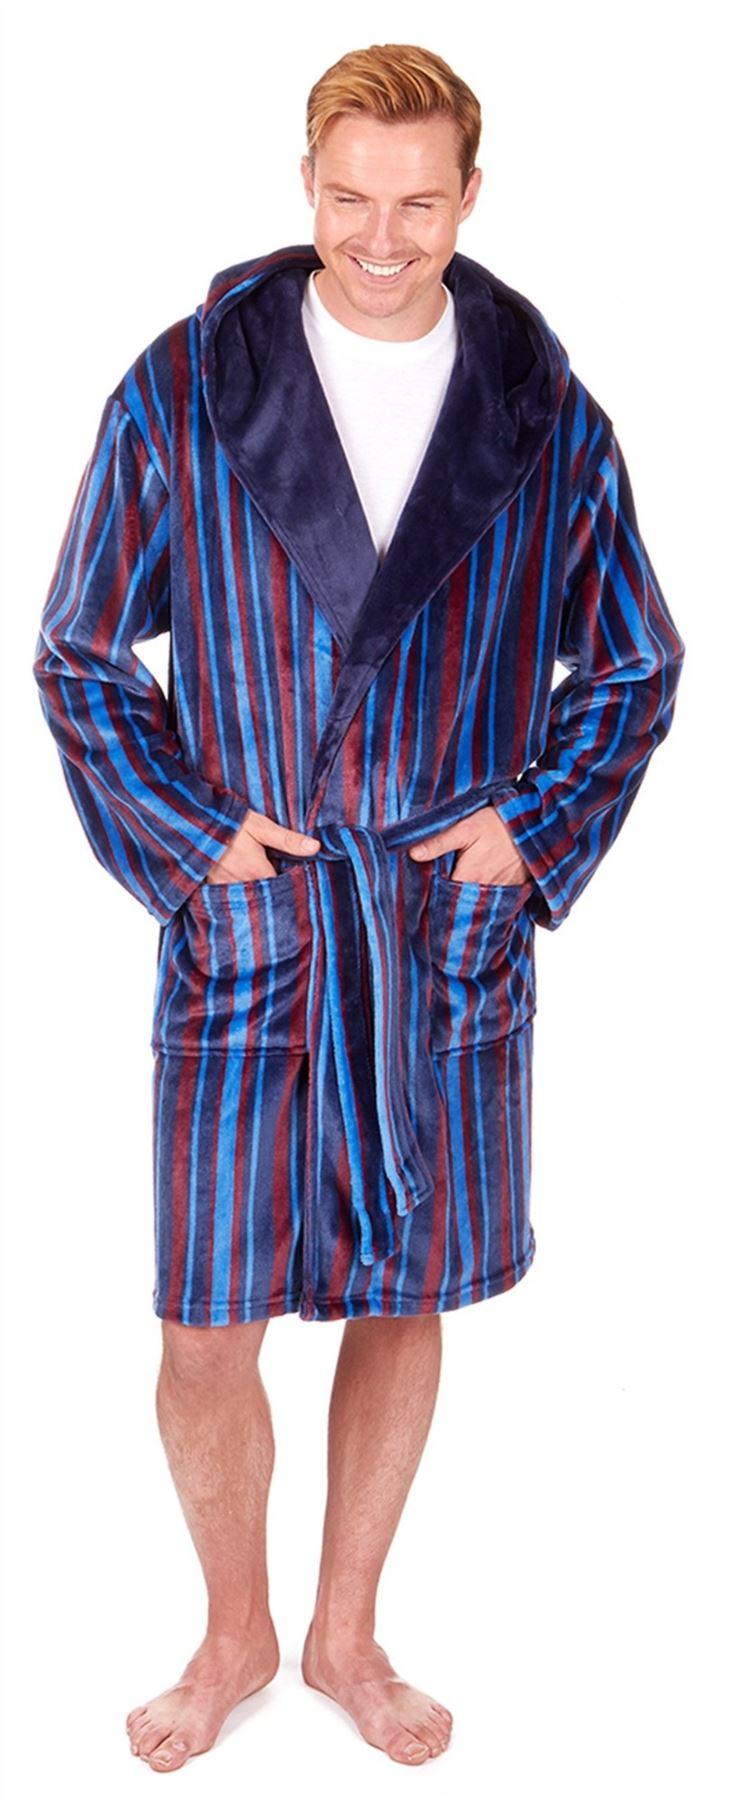 Gents Sleepy Joes 31b475 Soft Coral Fleece Striped Hooded Dressing ... e07b79120